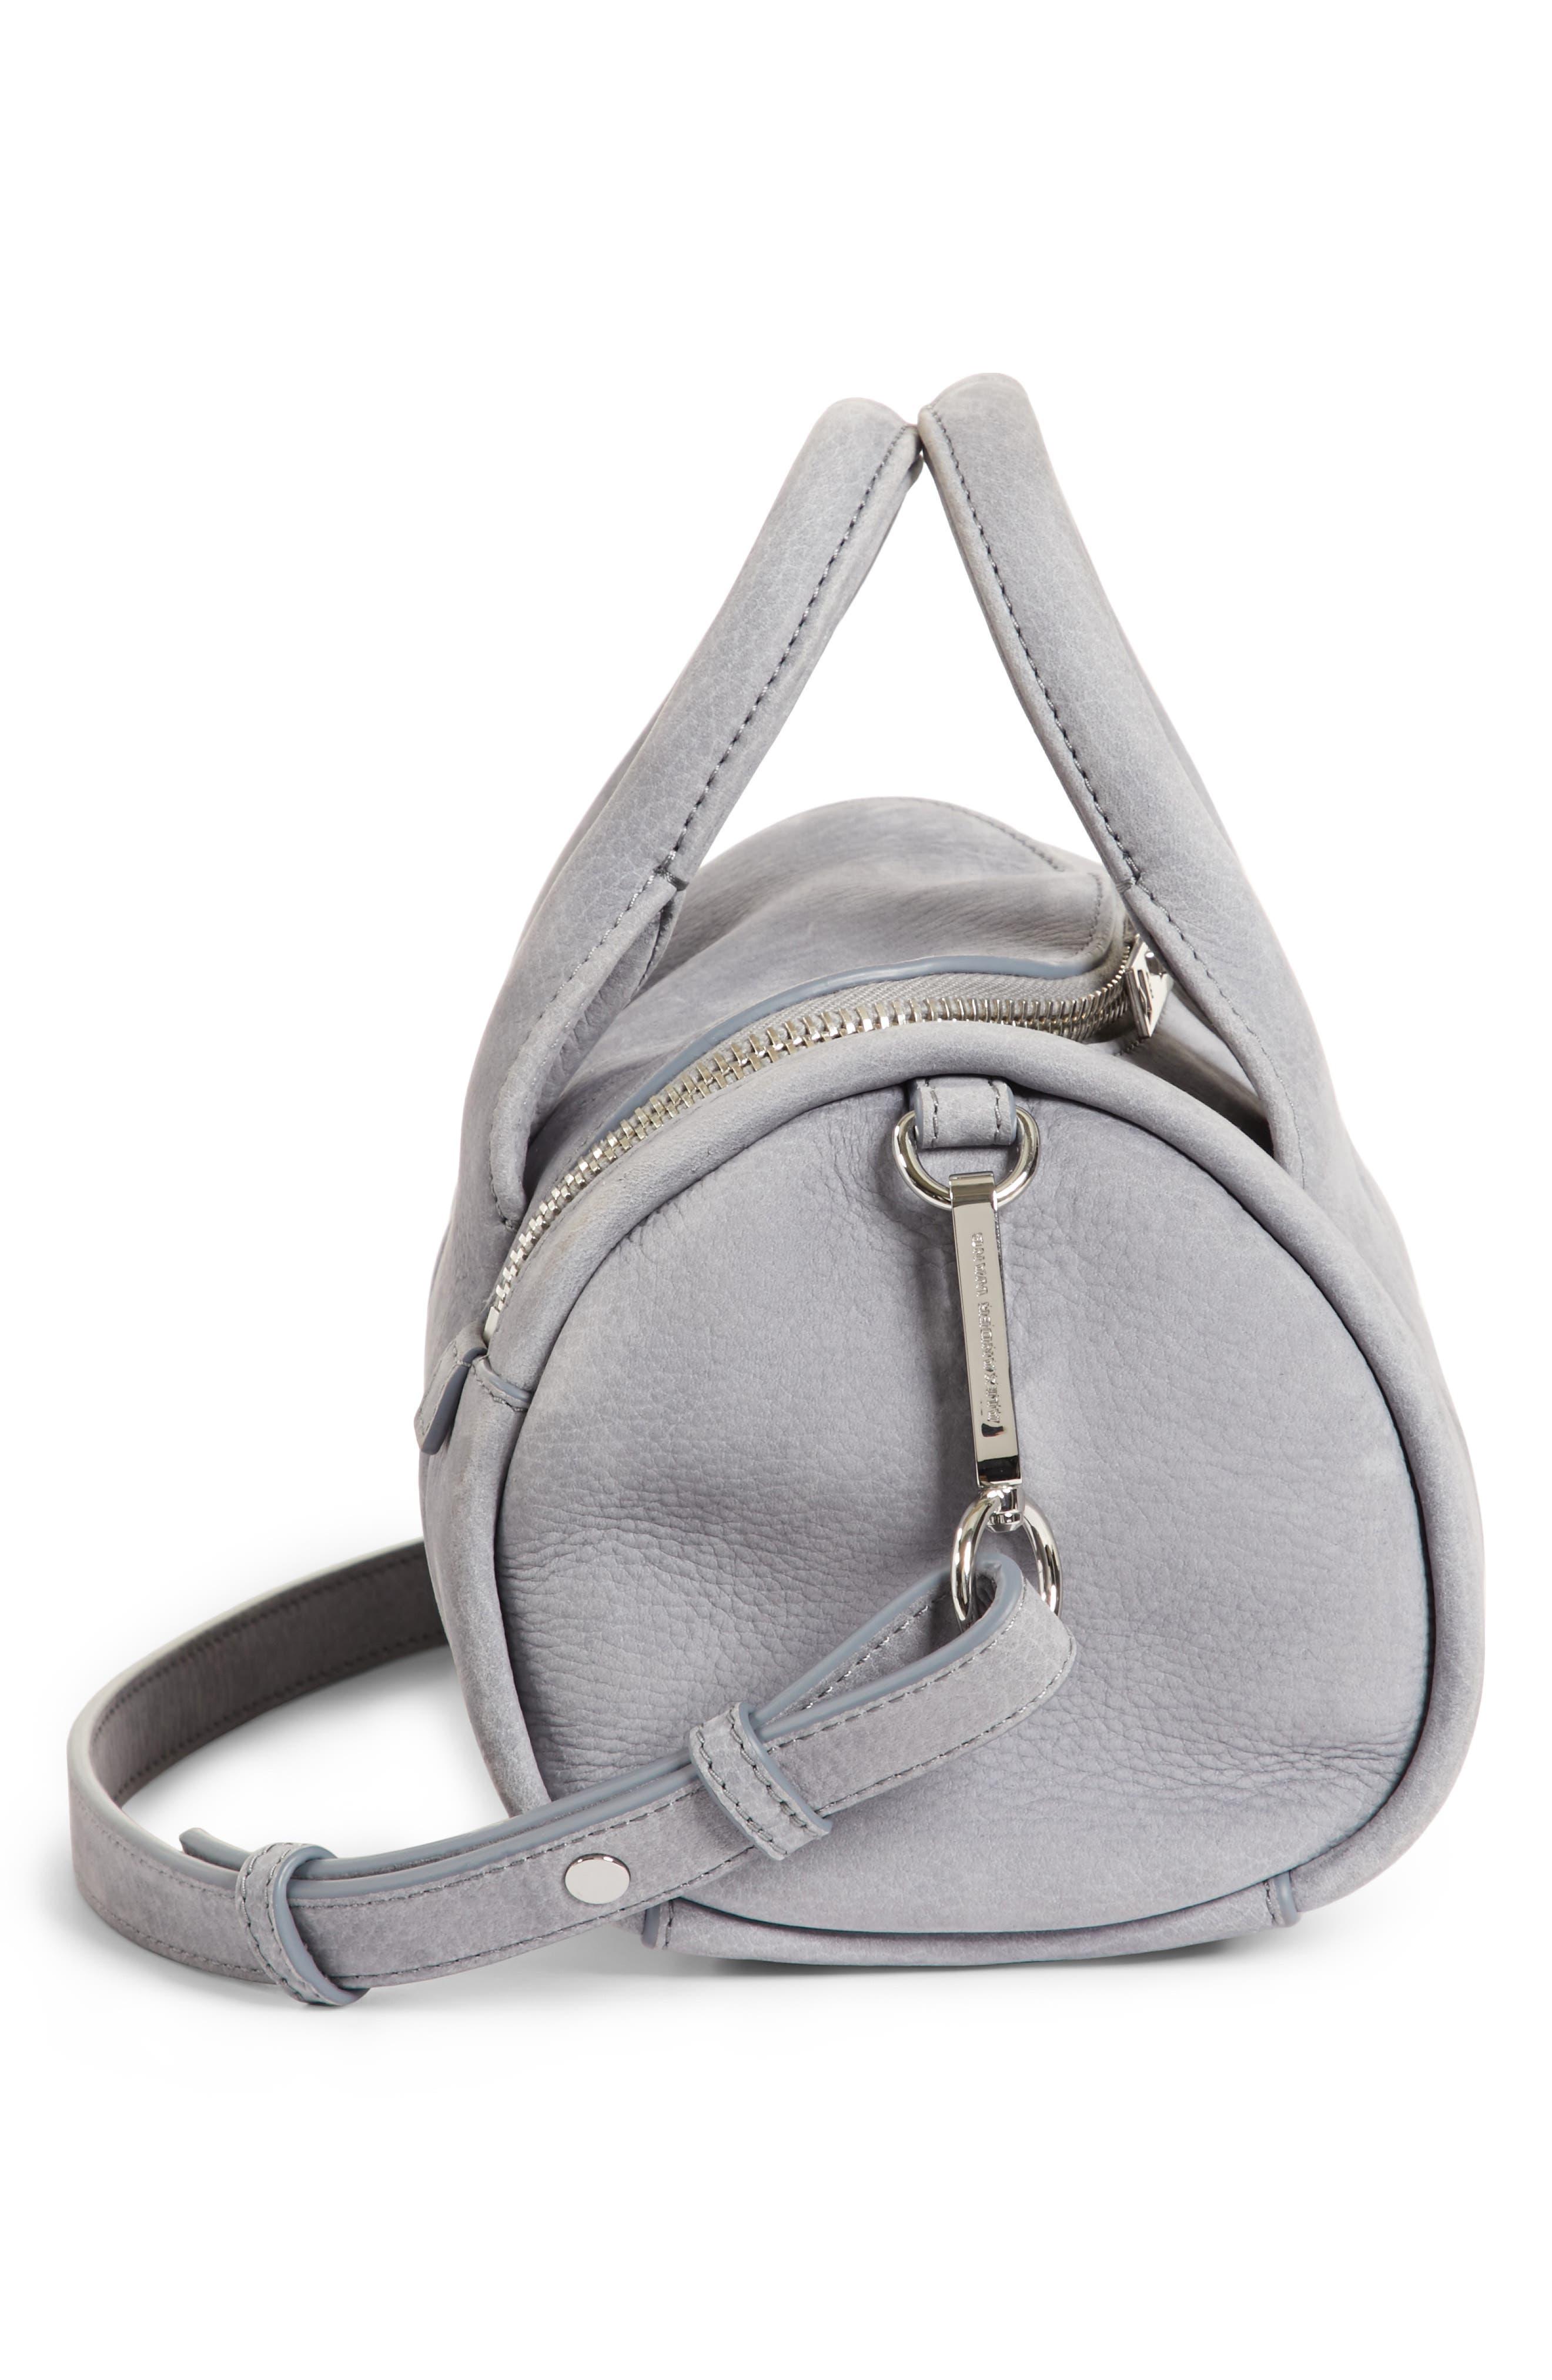 Mini Rockie - Nickel Leather Satchel,                             Alternate thumbnail 5, color,                             461